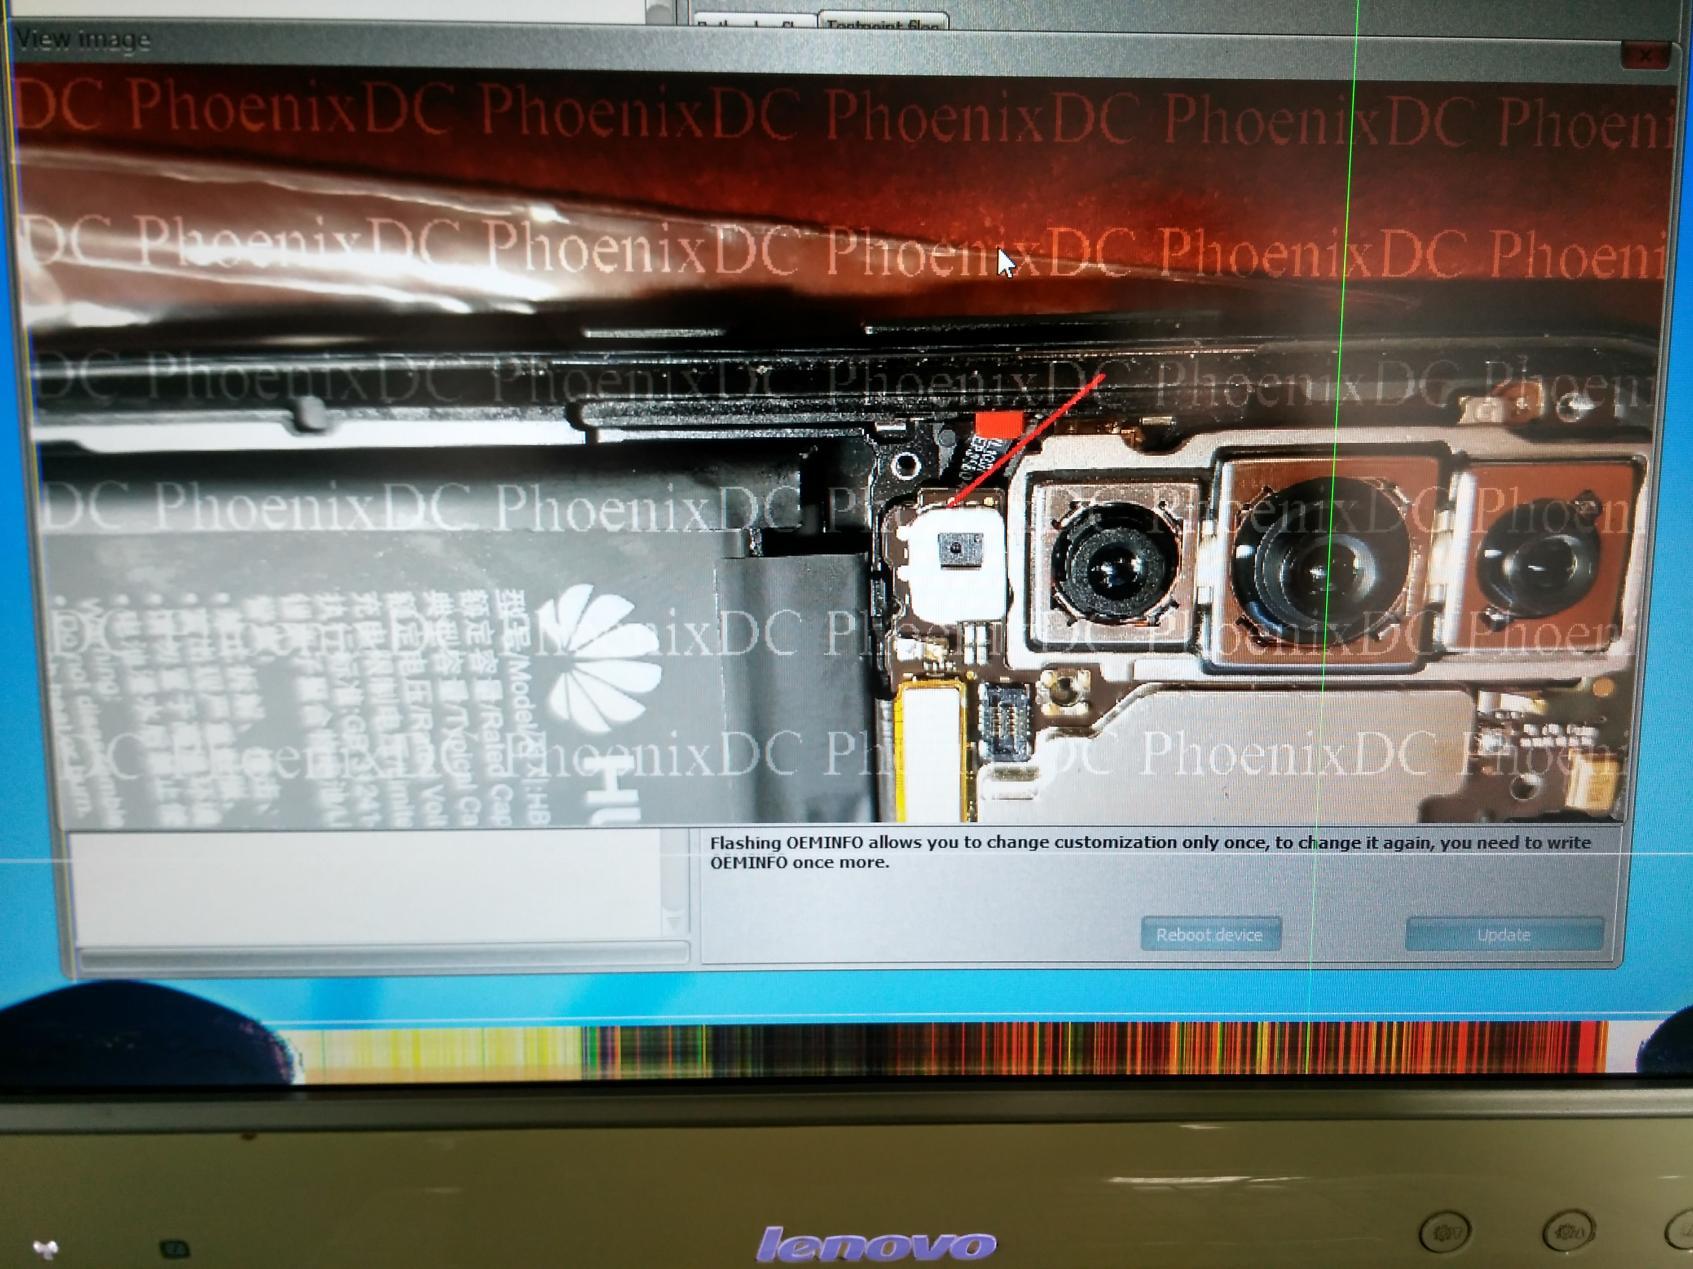 إزالة قفل غوغل عن جهاز Huawei P20 Pro بوضع com 1.0 بواسطة EFT Dongle